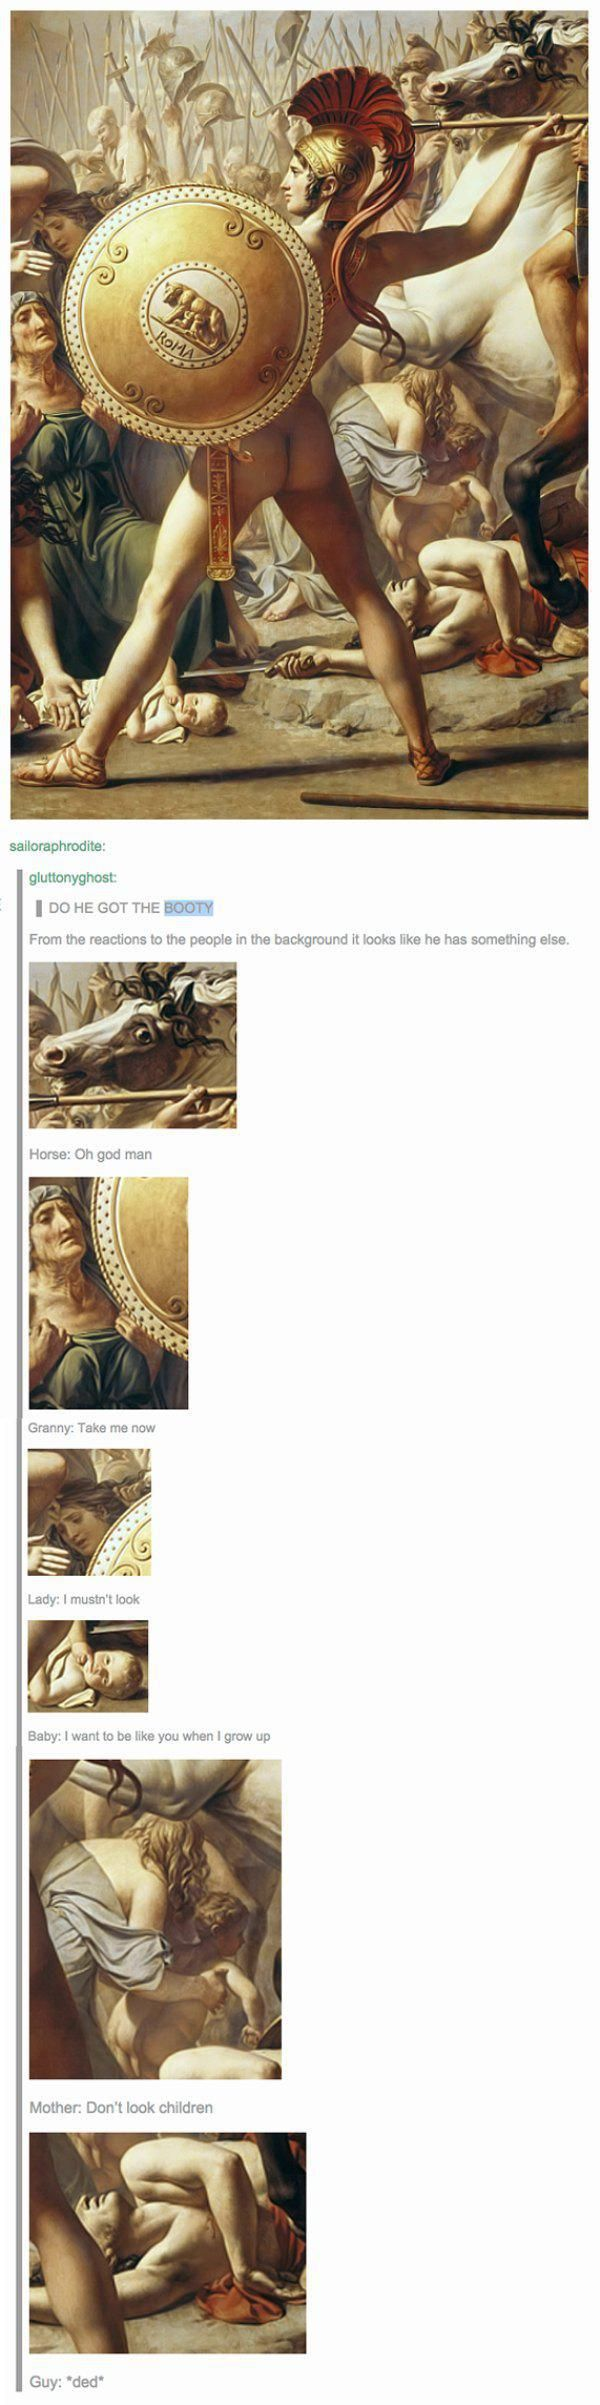 History According To Tumblr Is Enjoyable For So Many Wrong Reasons - ViralDire